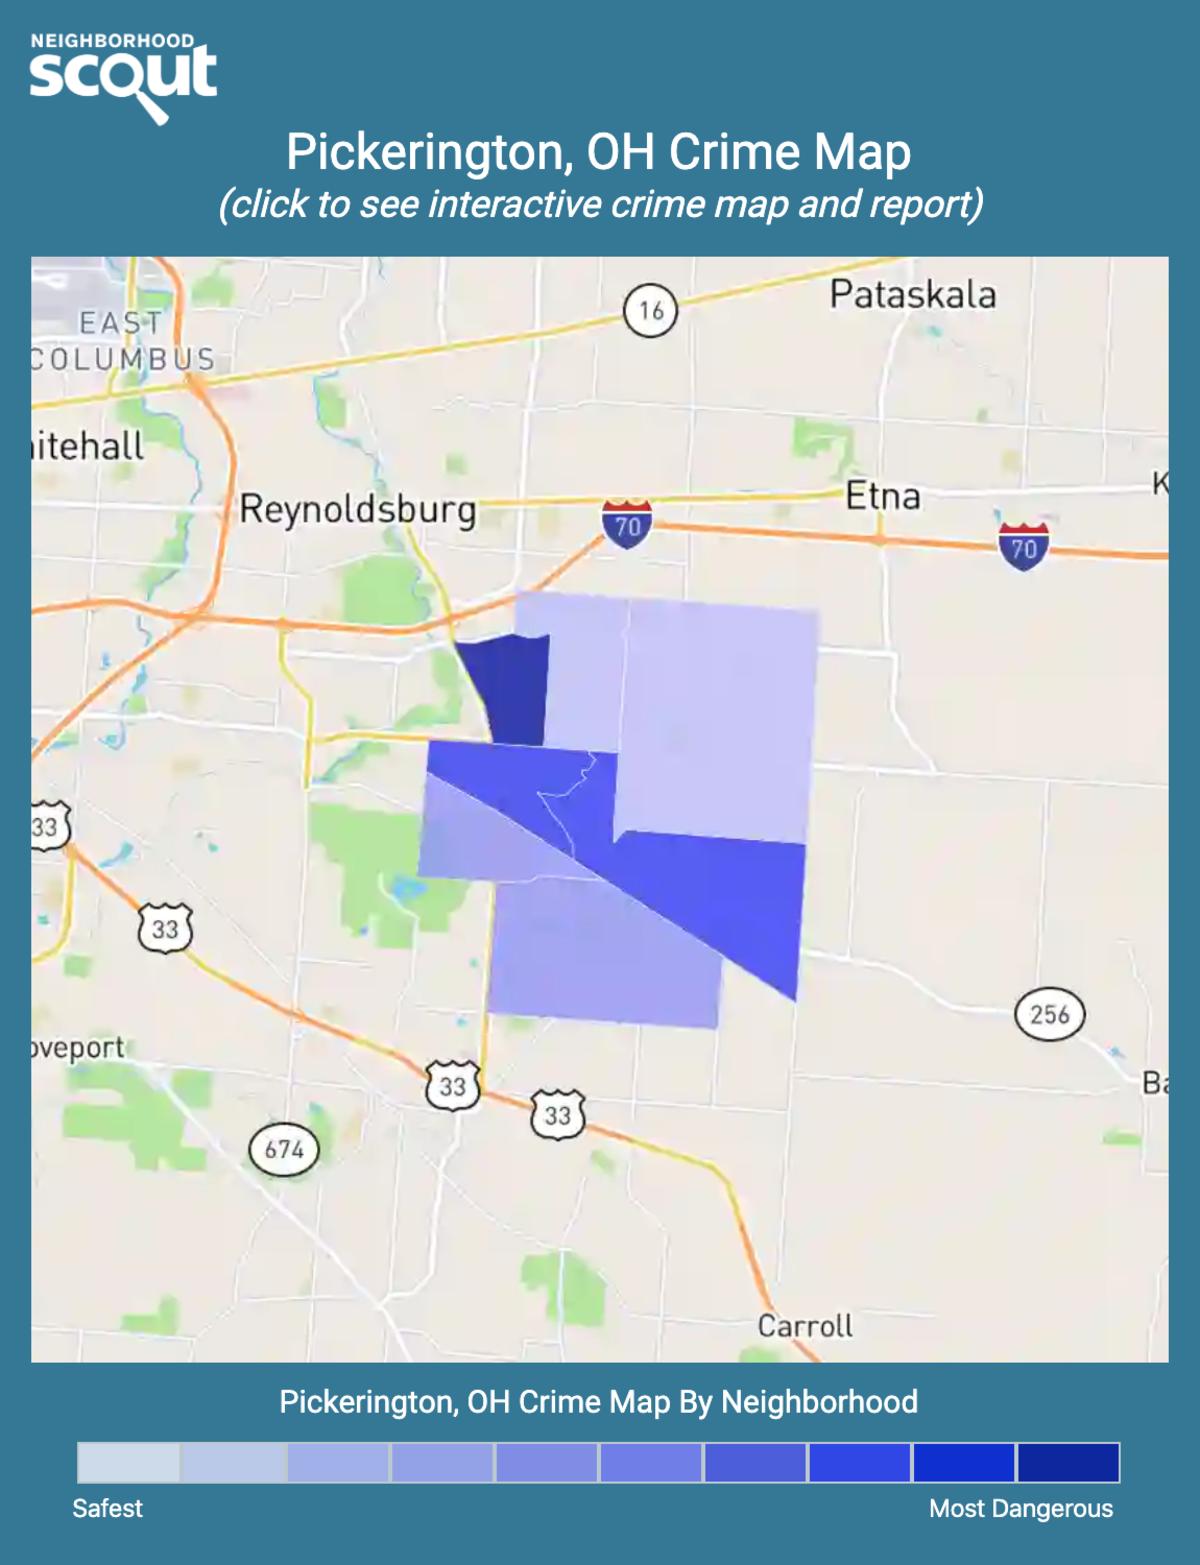 Pickerington, Ohio crime map